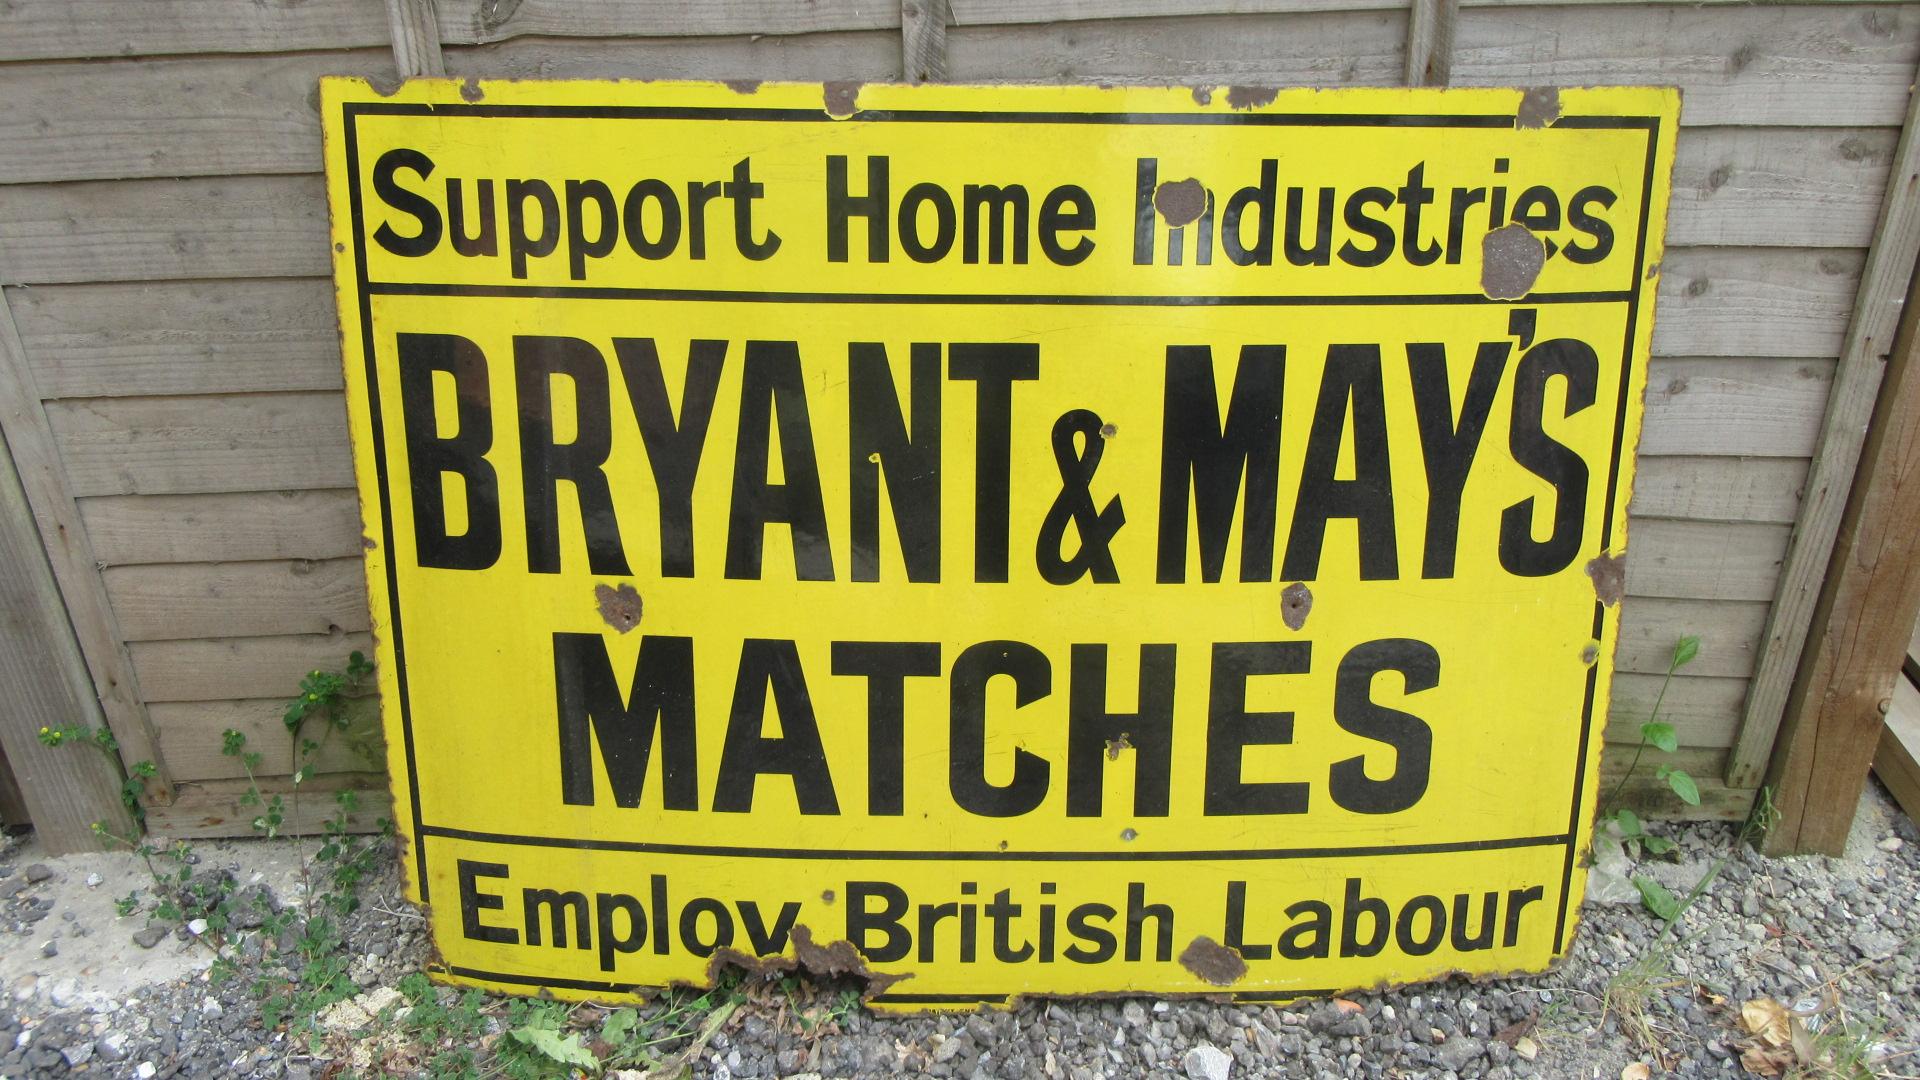 ANTIQUE BRYANT & MAY ENAMEL ADVERTISING SIGN